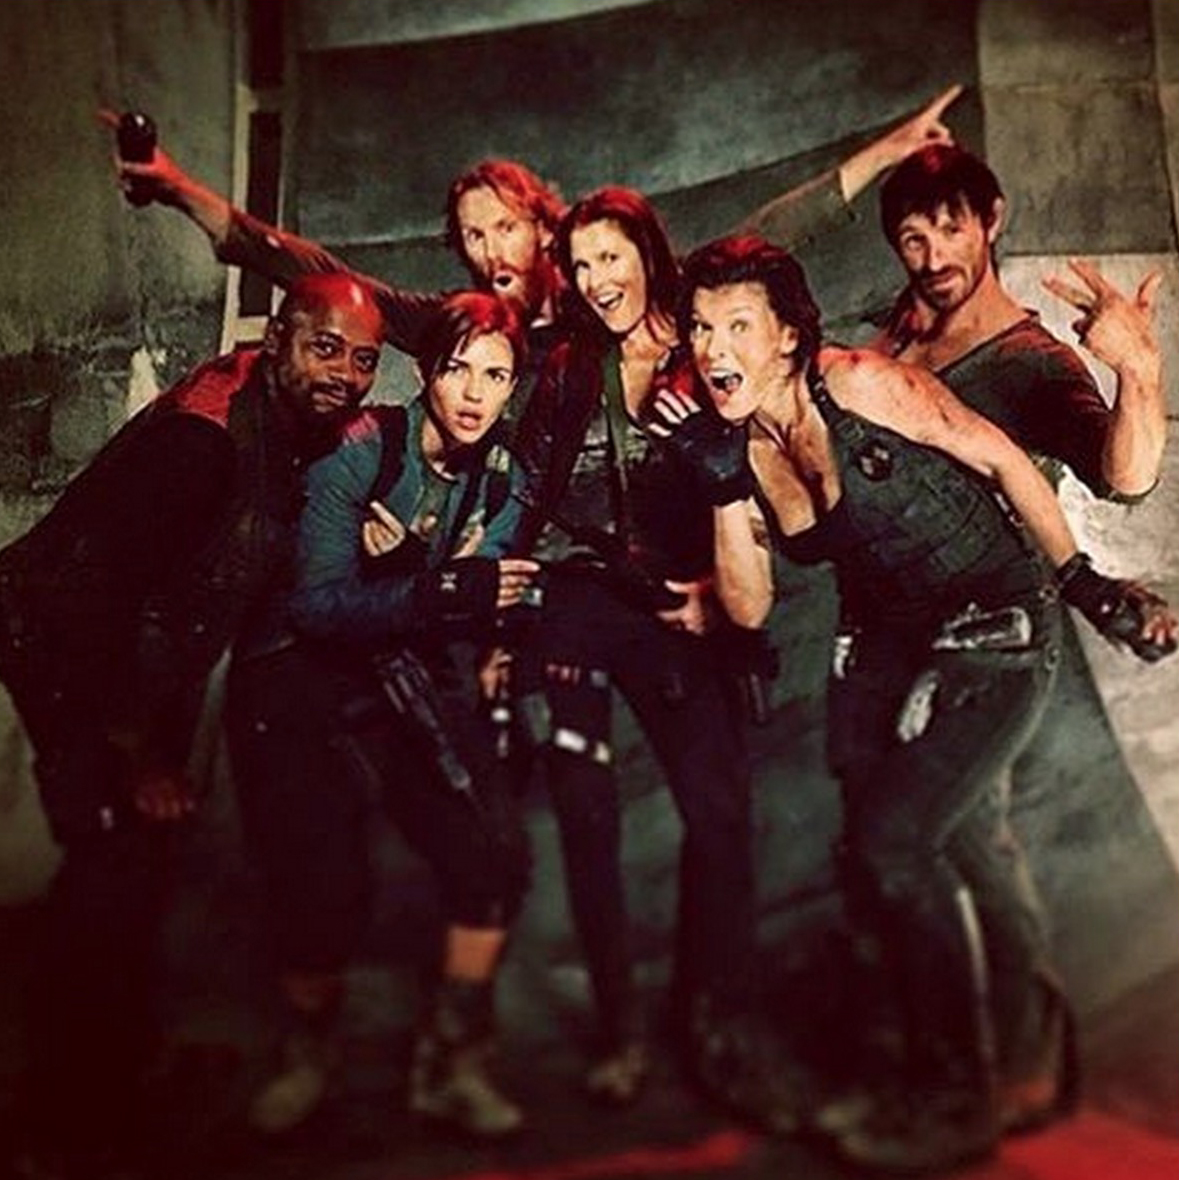 Millaj Com The Official Milla Jovovich Website Resident Evil